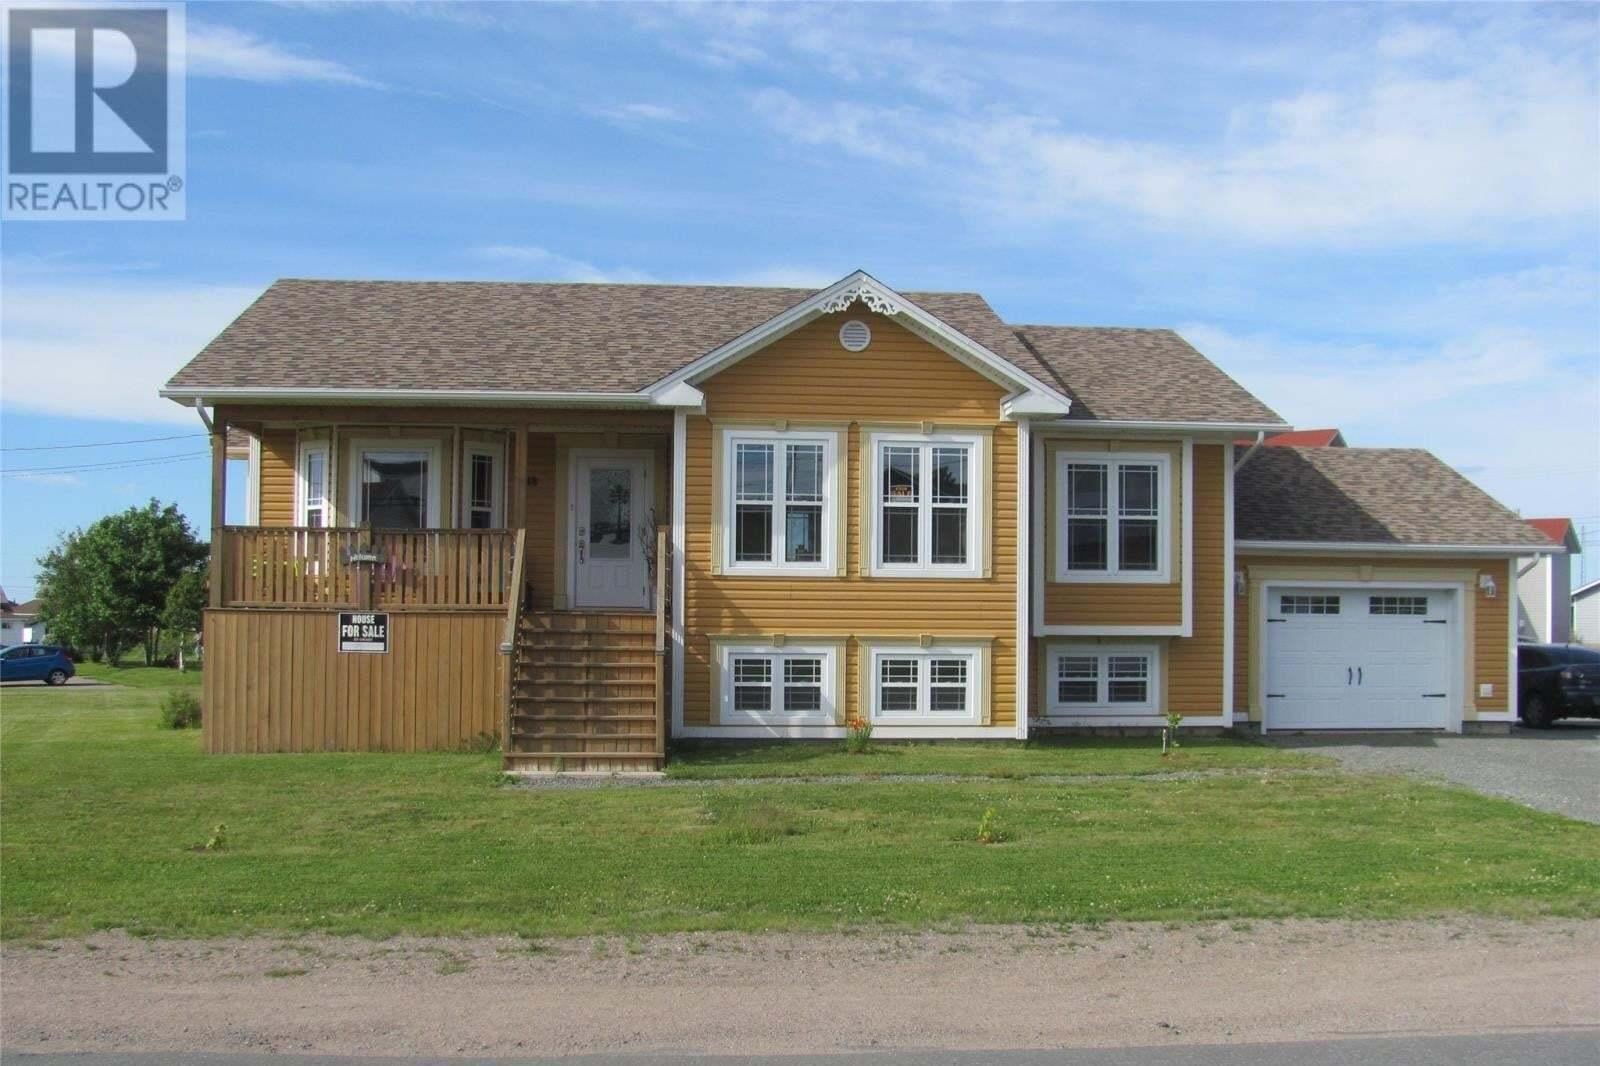 House for sale at 48 Hospital Rd Bonavista Newfoundland - MLS: 1216502